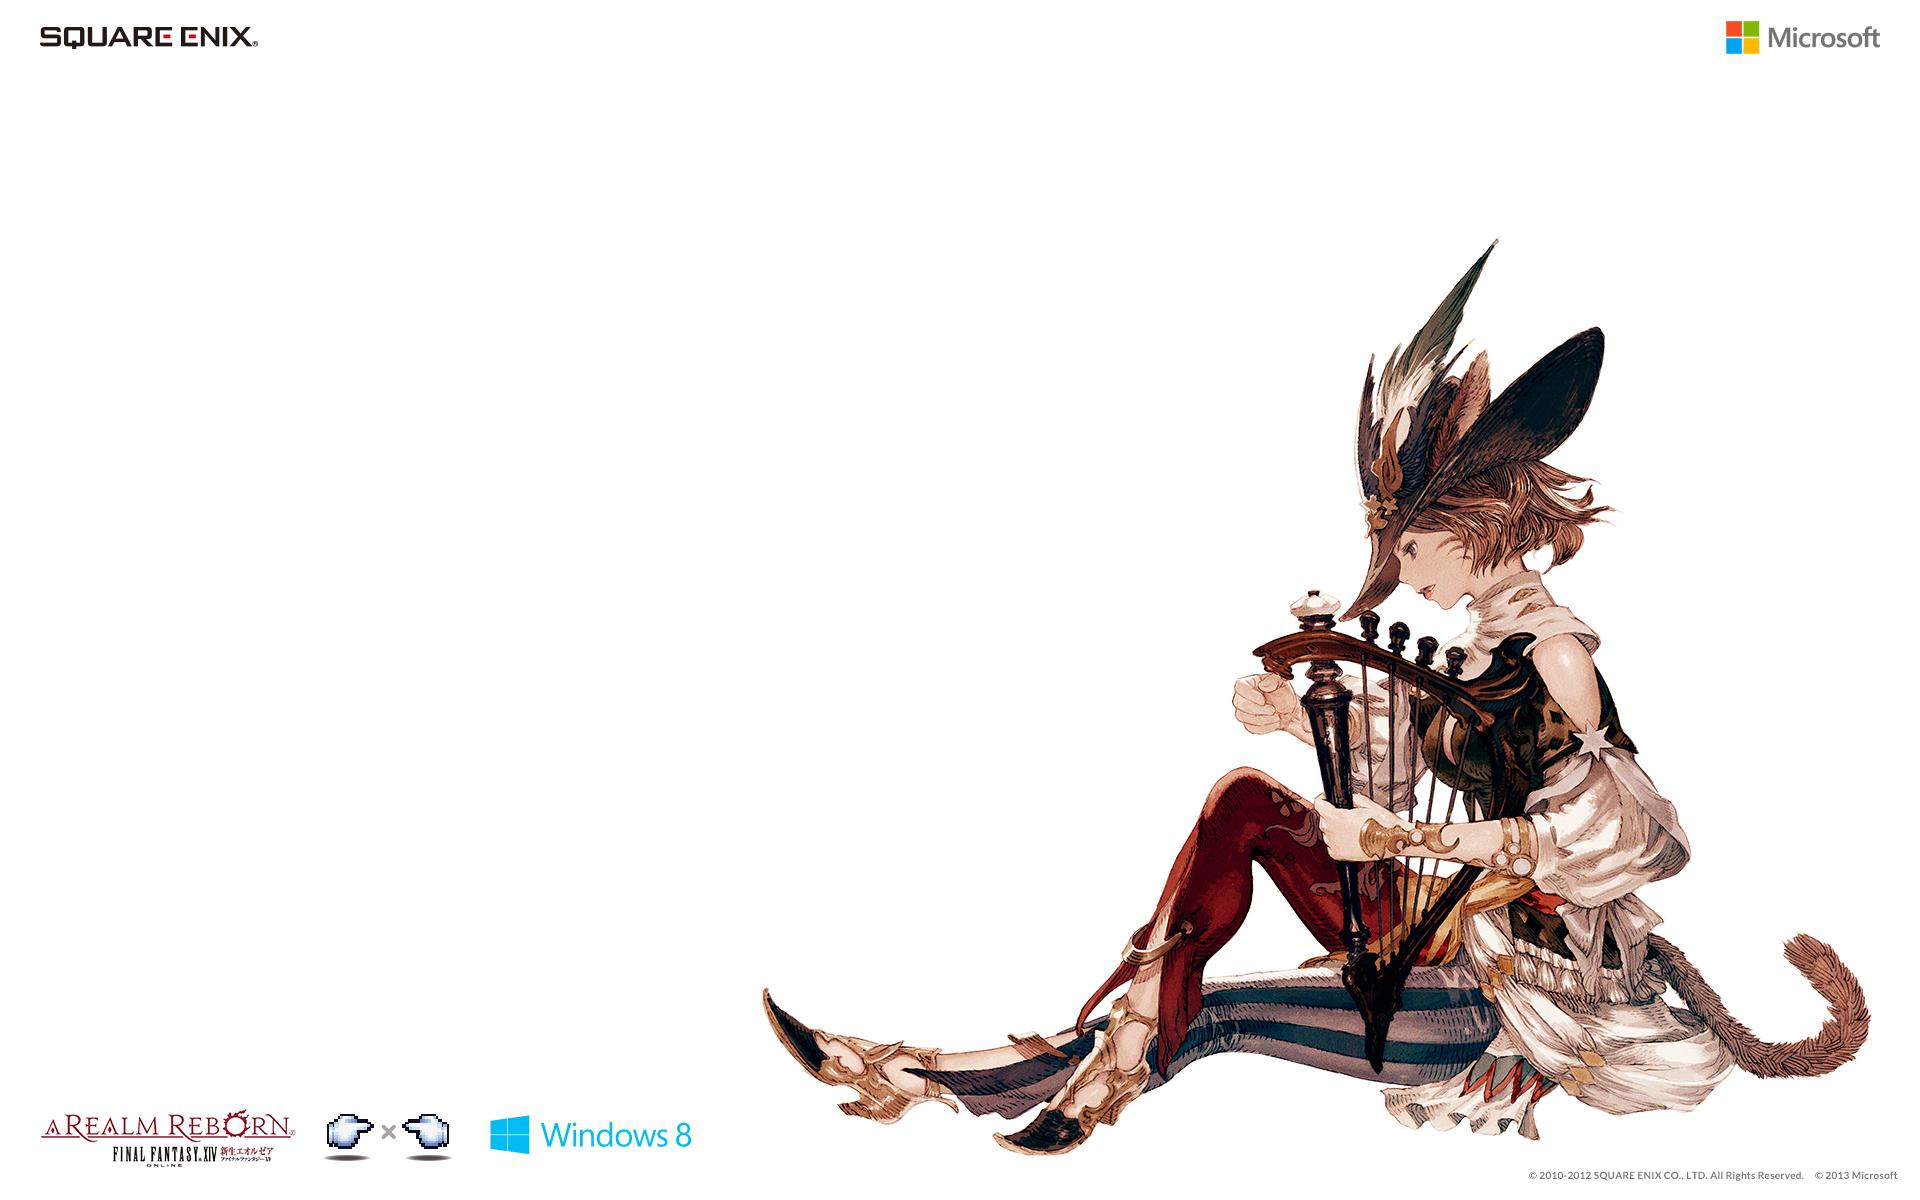 final fantasy xiv a realm reborn hd wallpaper background image